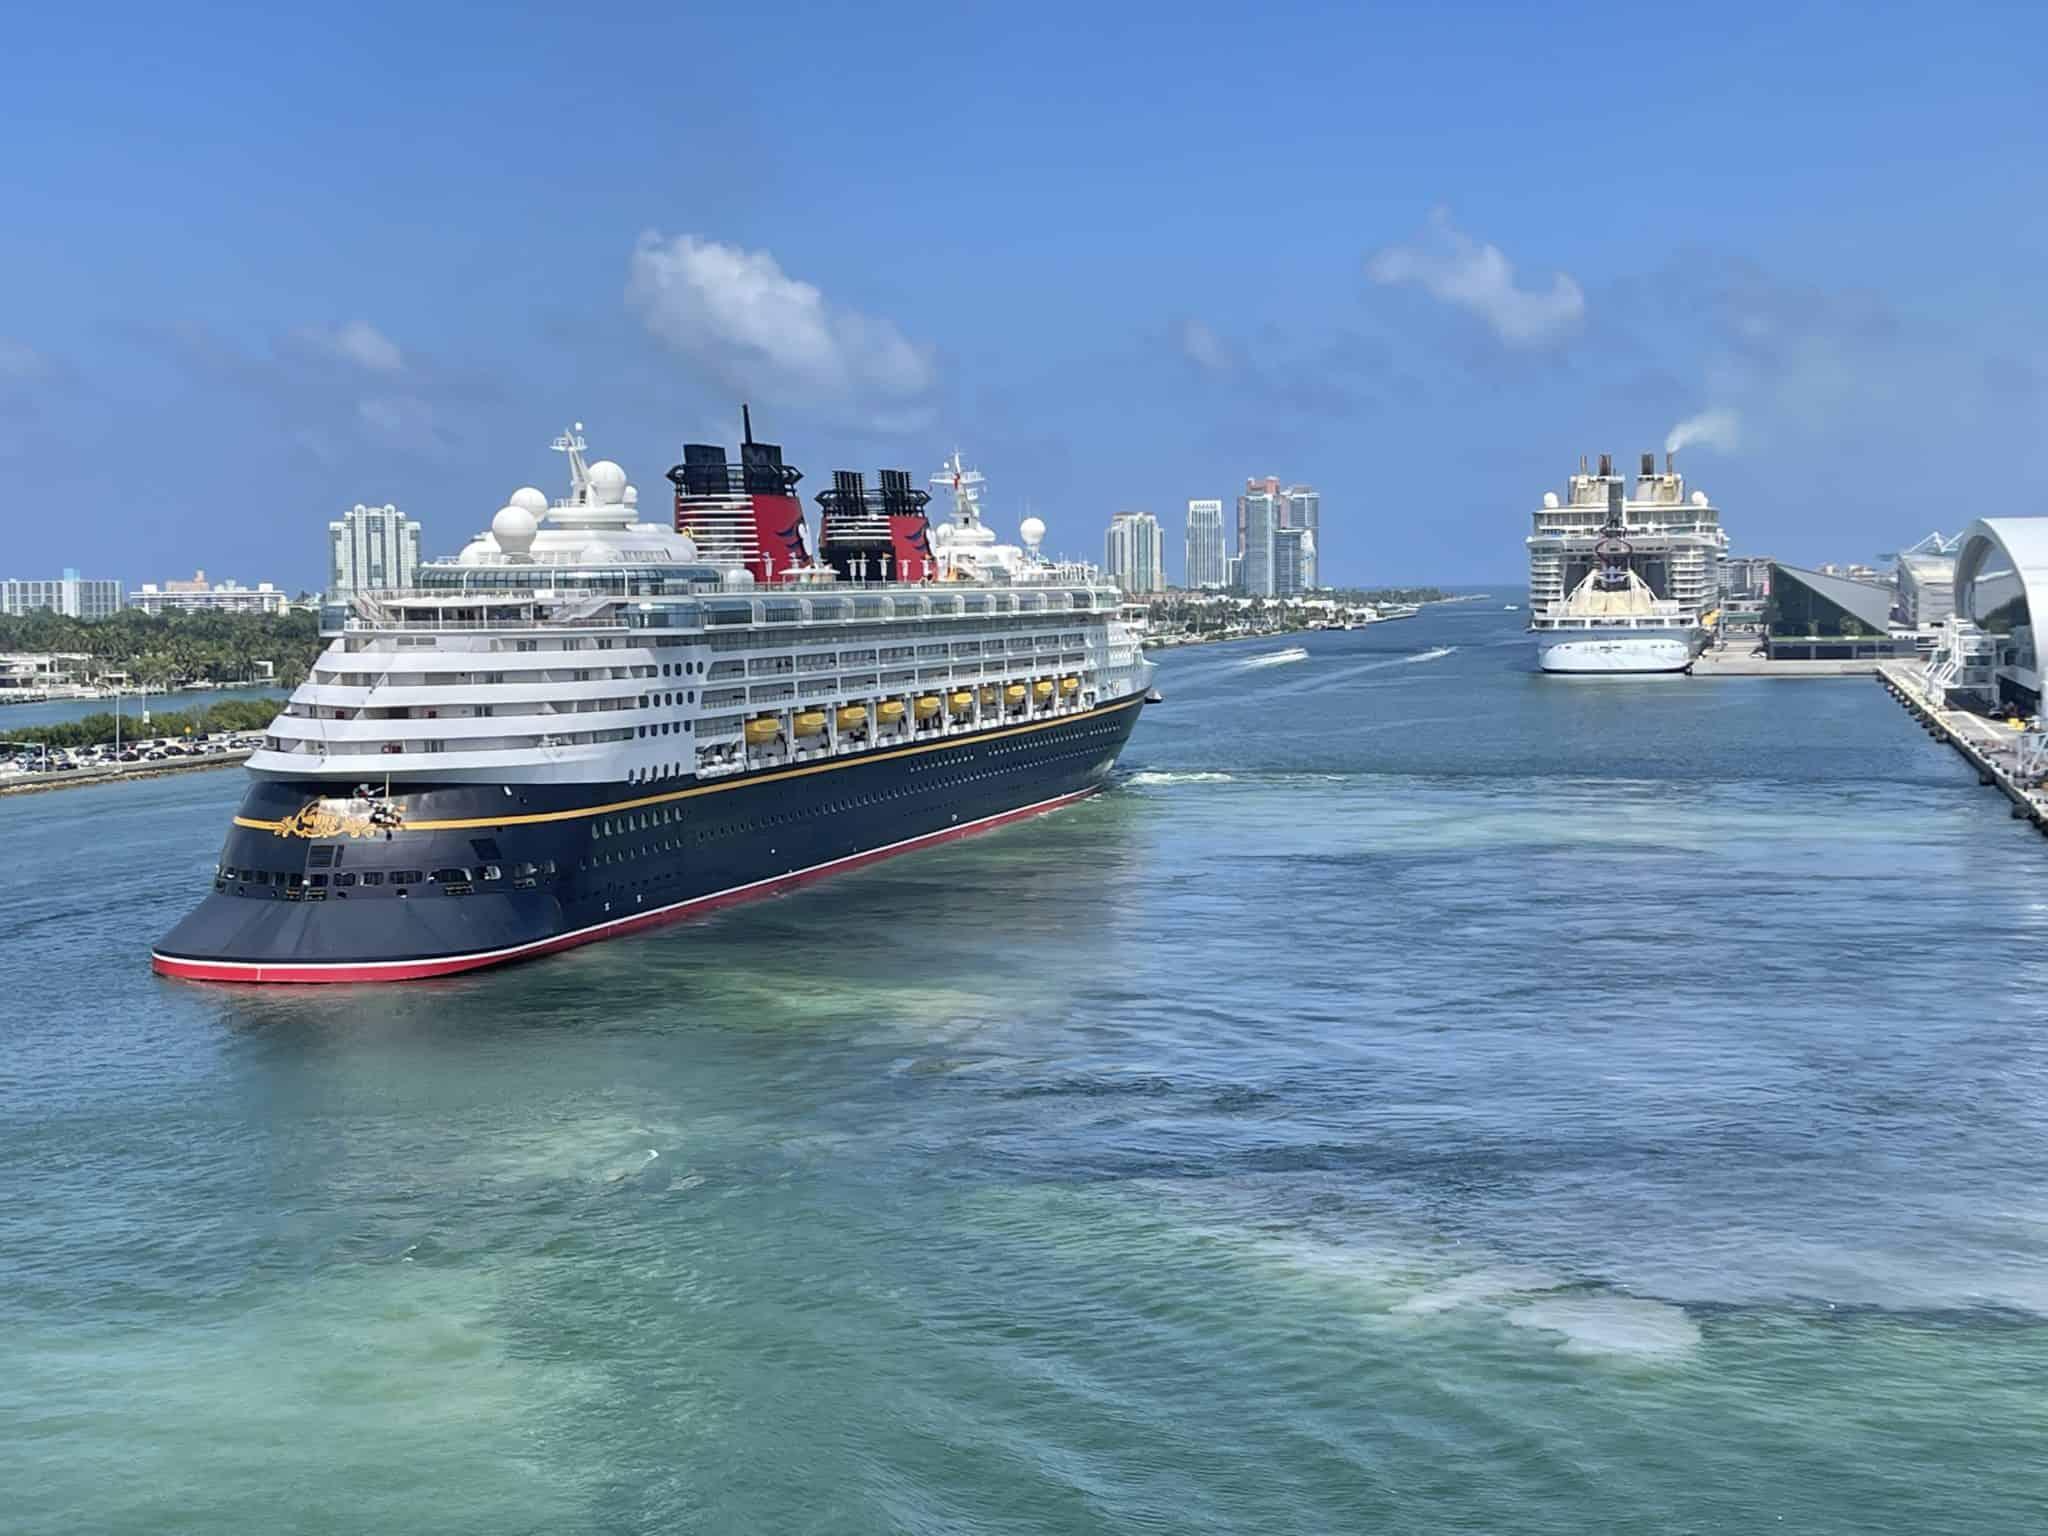 disney wonder multiple ships PortMiami florida